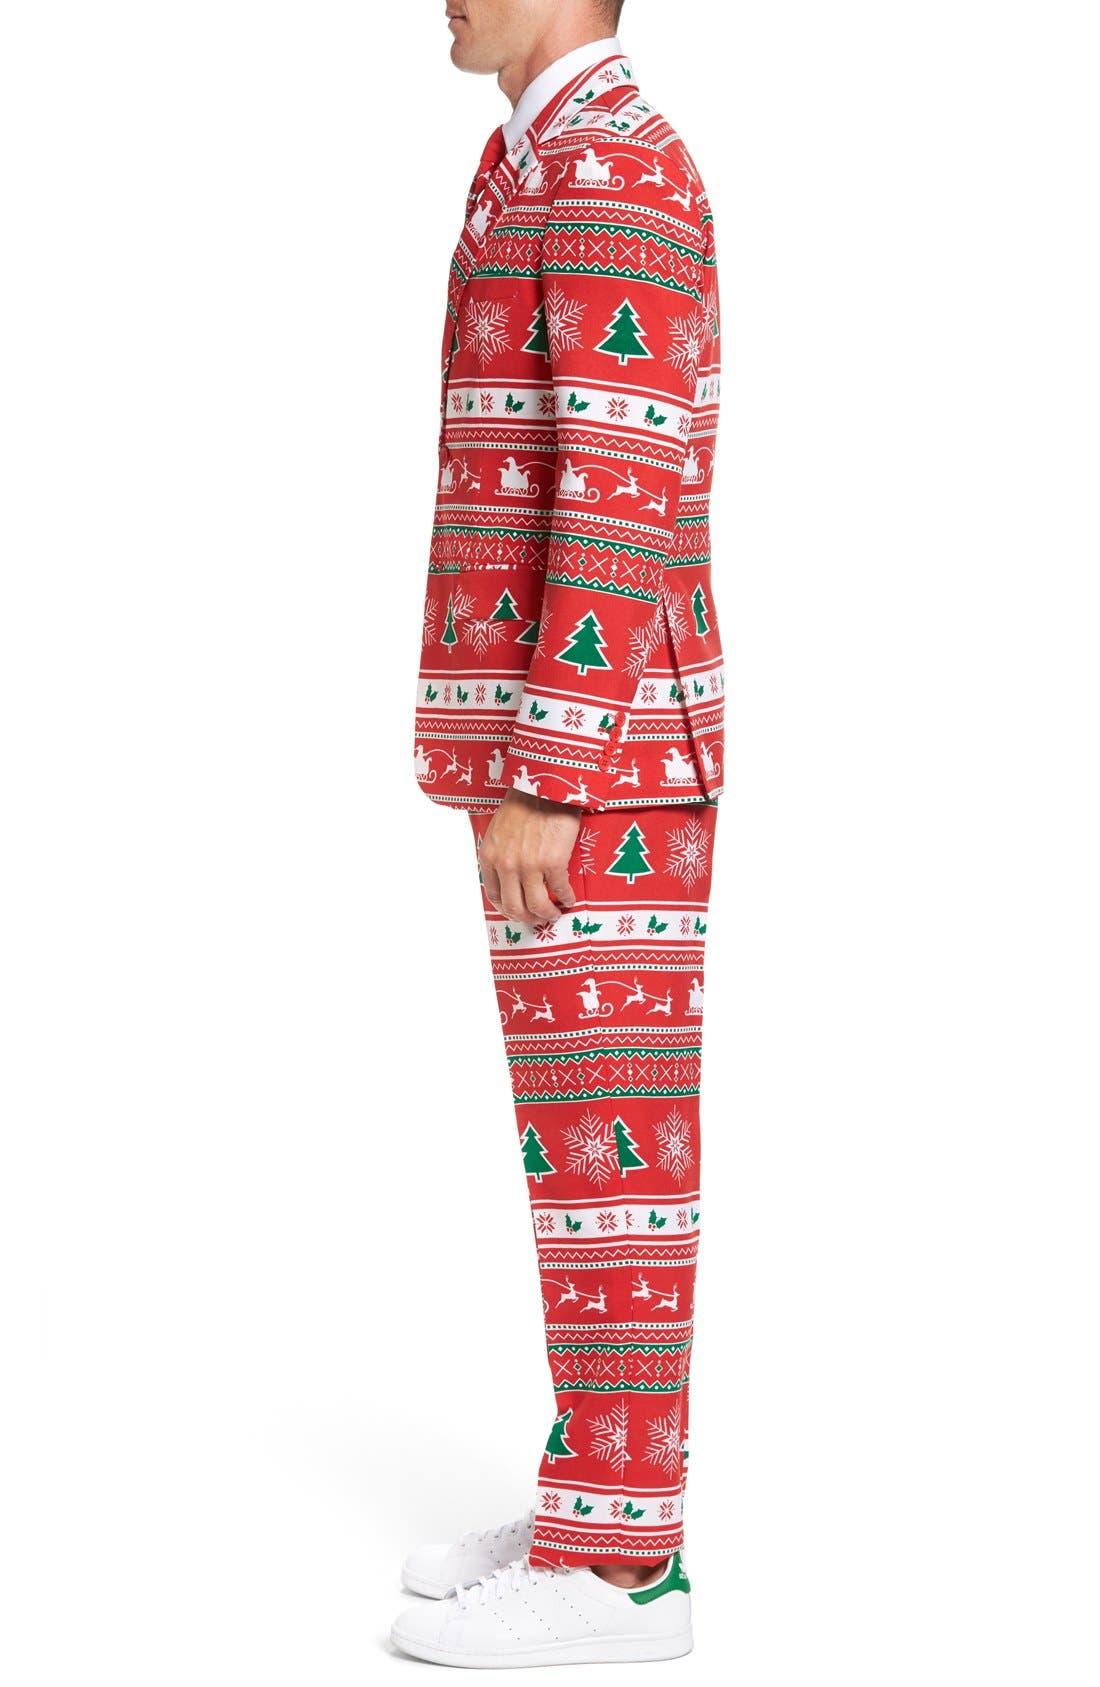 'Winter Wonderland' Trim Fit Two-Piece Suit with Tie,                             Alternate thumbnail 3, color,                             601